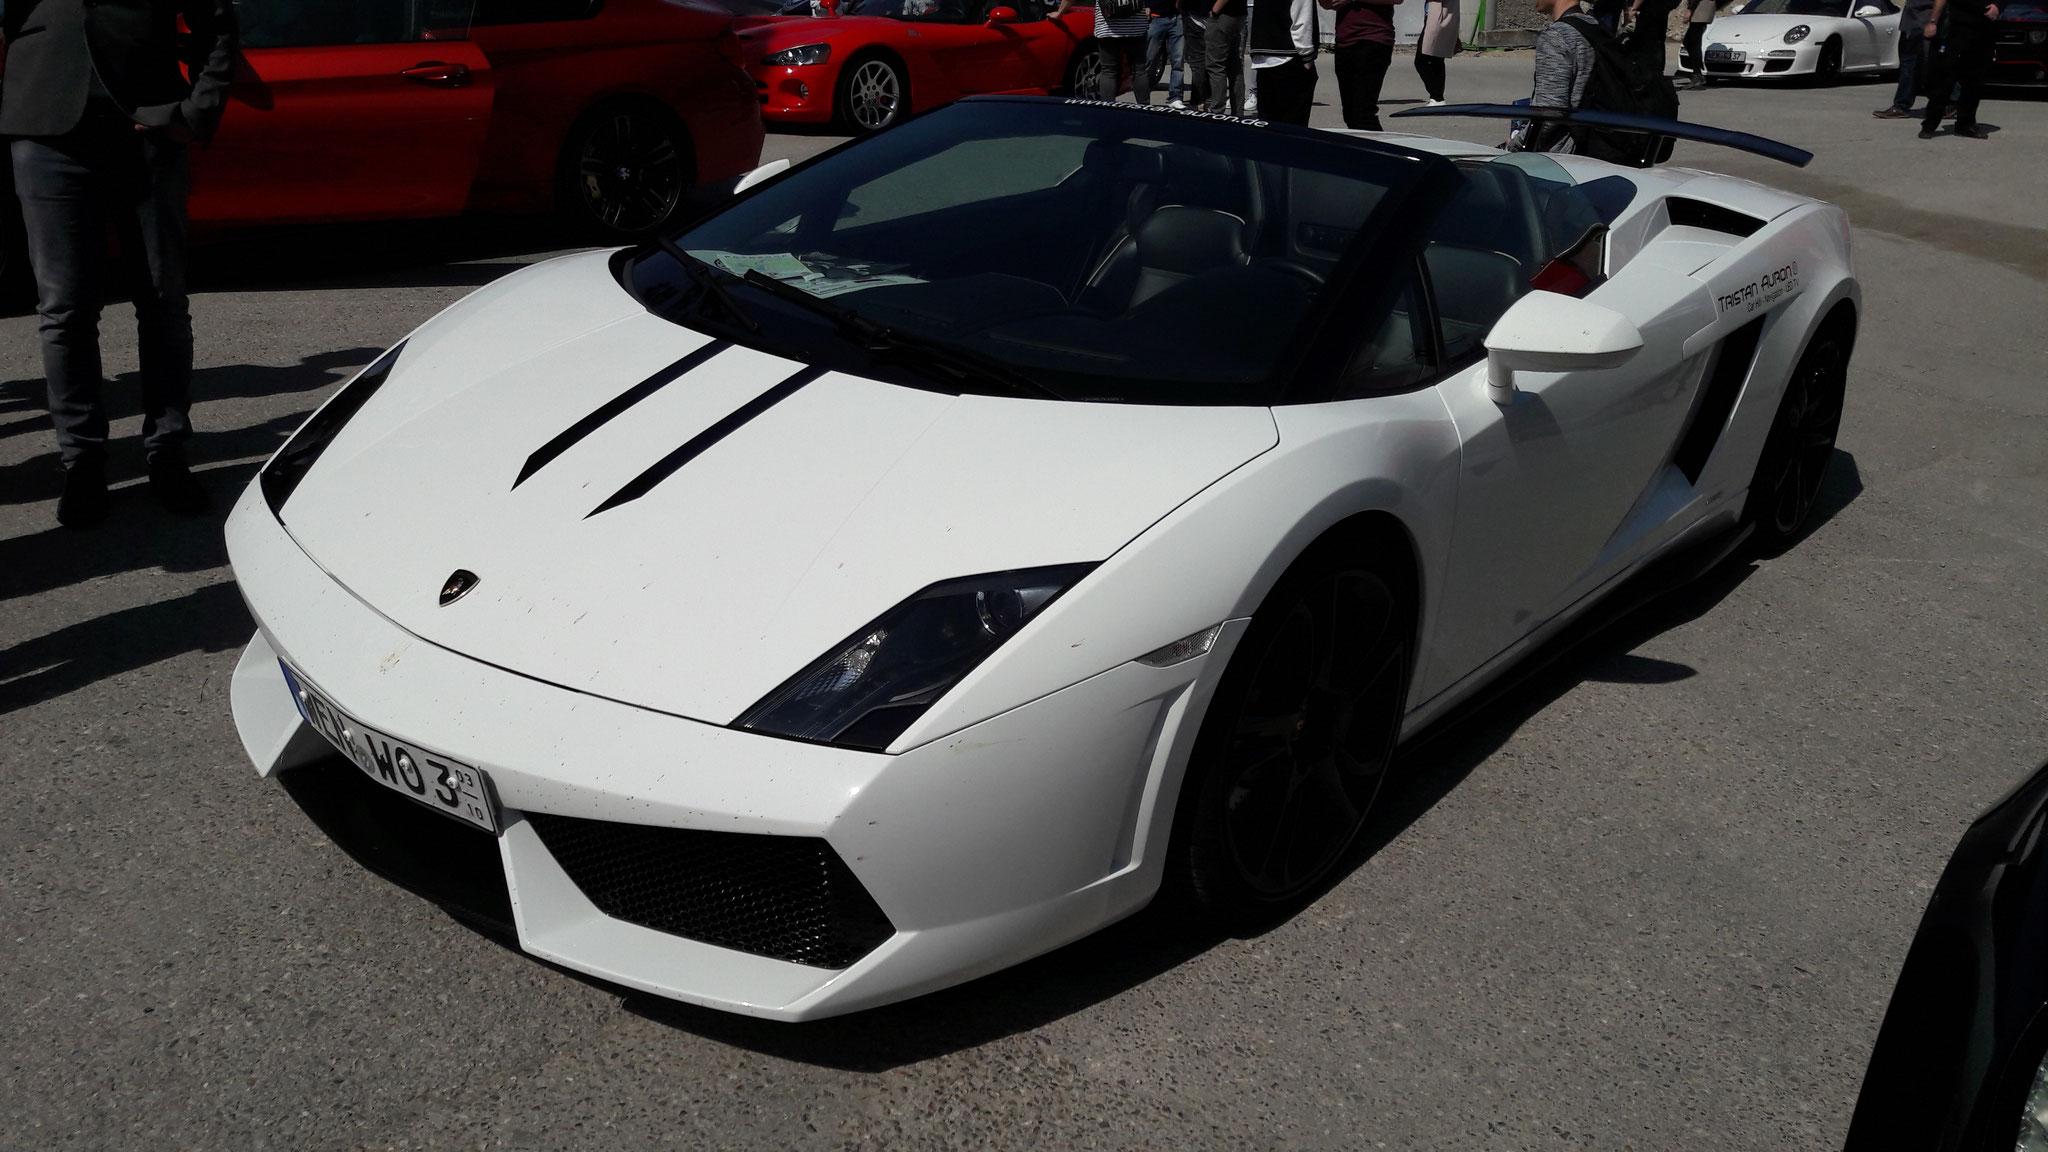 Lamborghini Gallardo LP 570-4 Performante - WEN-WO-3